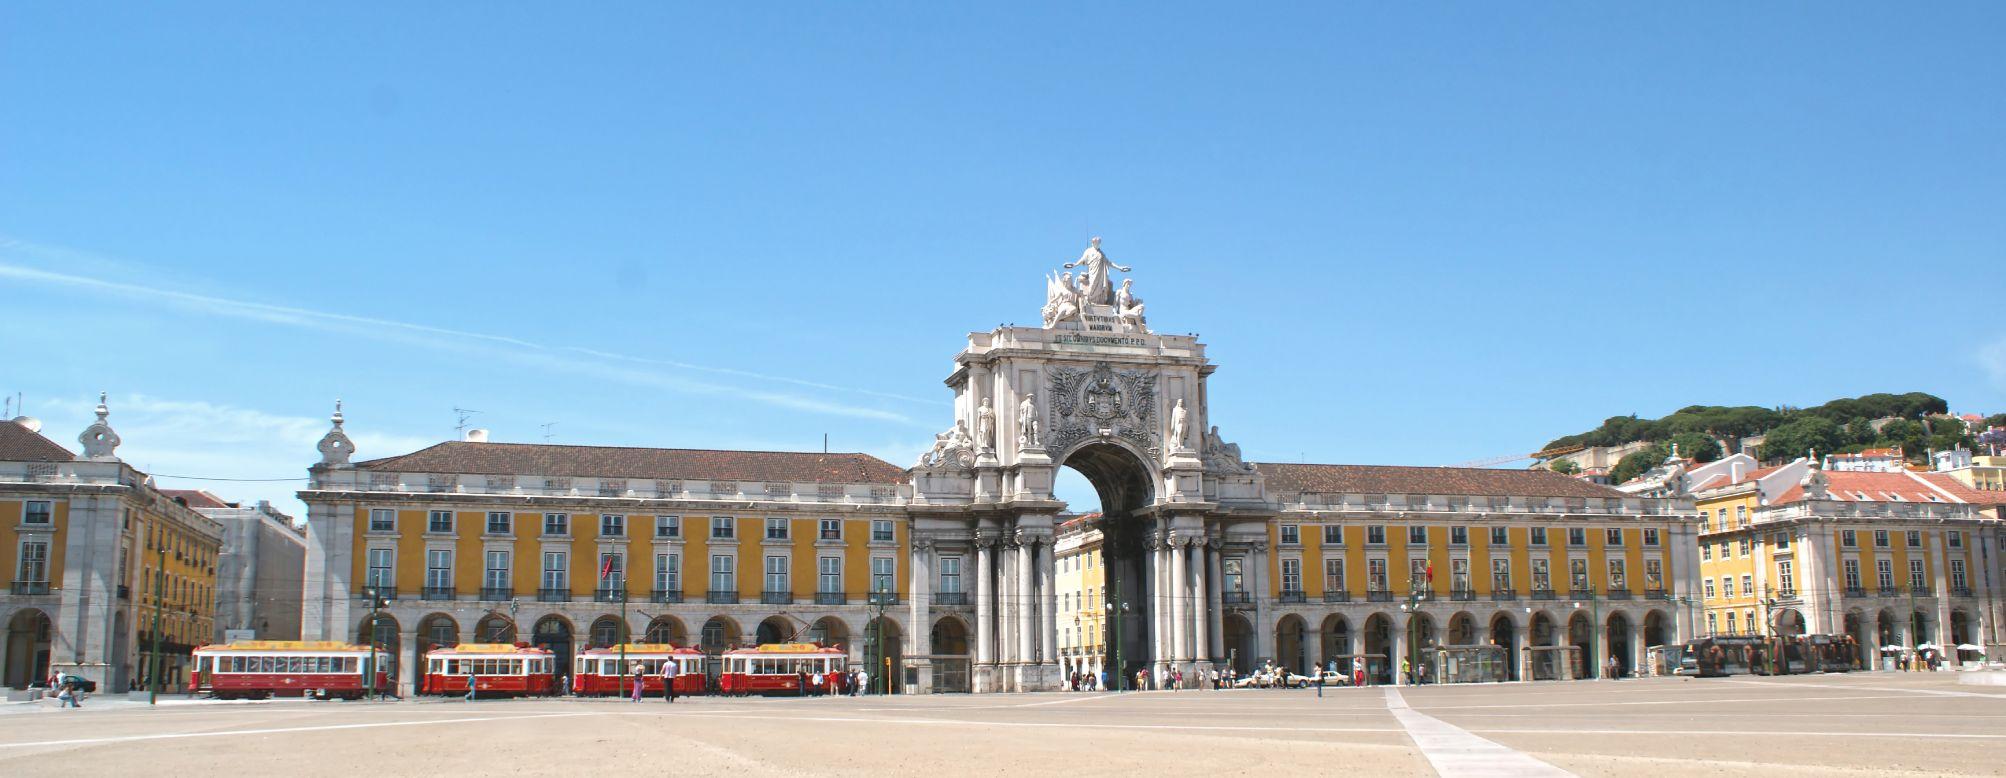 Terreiro do Paço, Lisboa